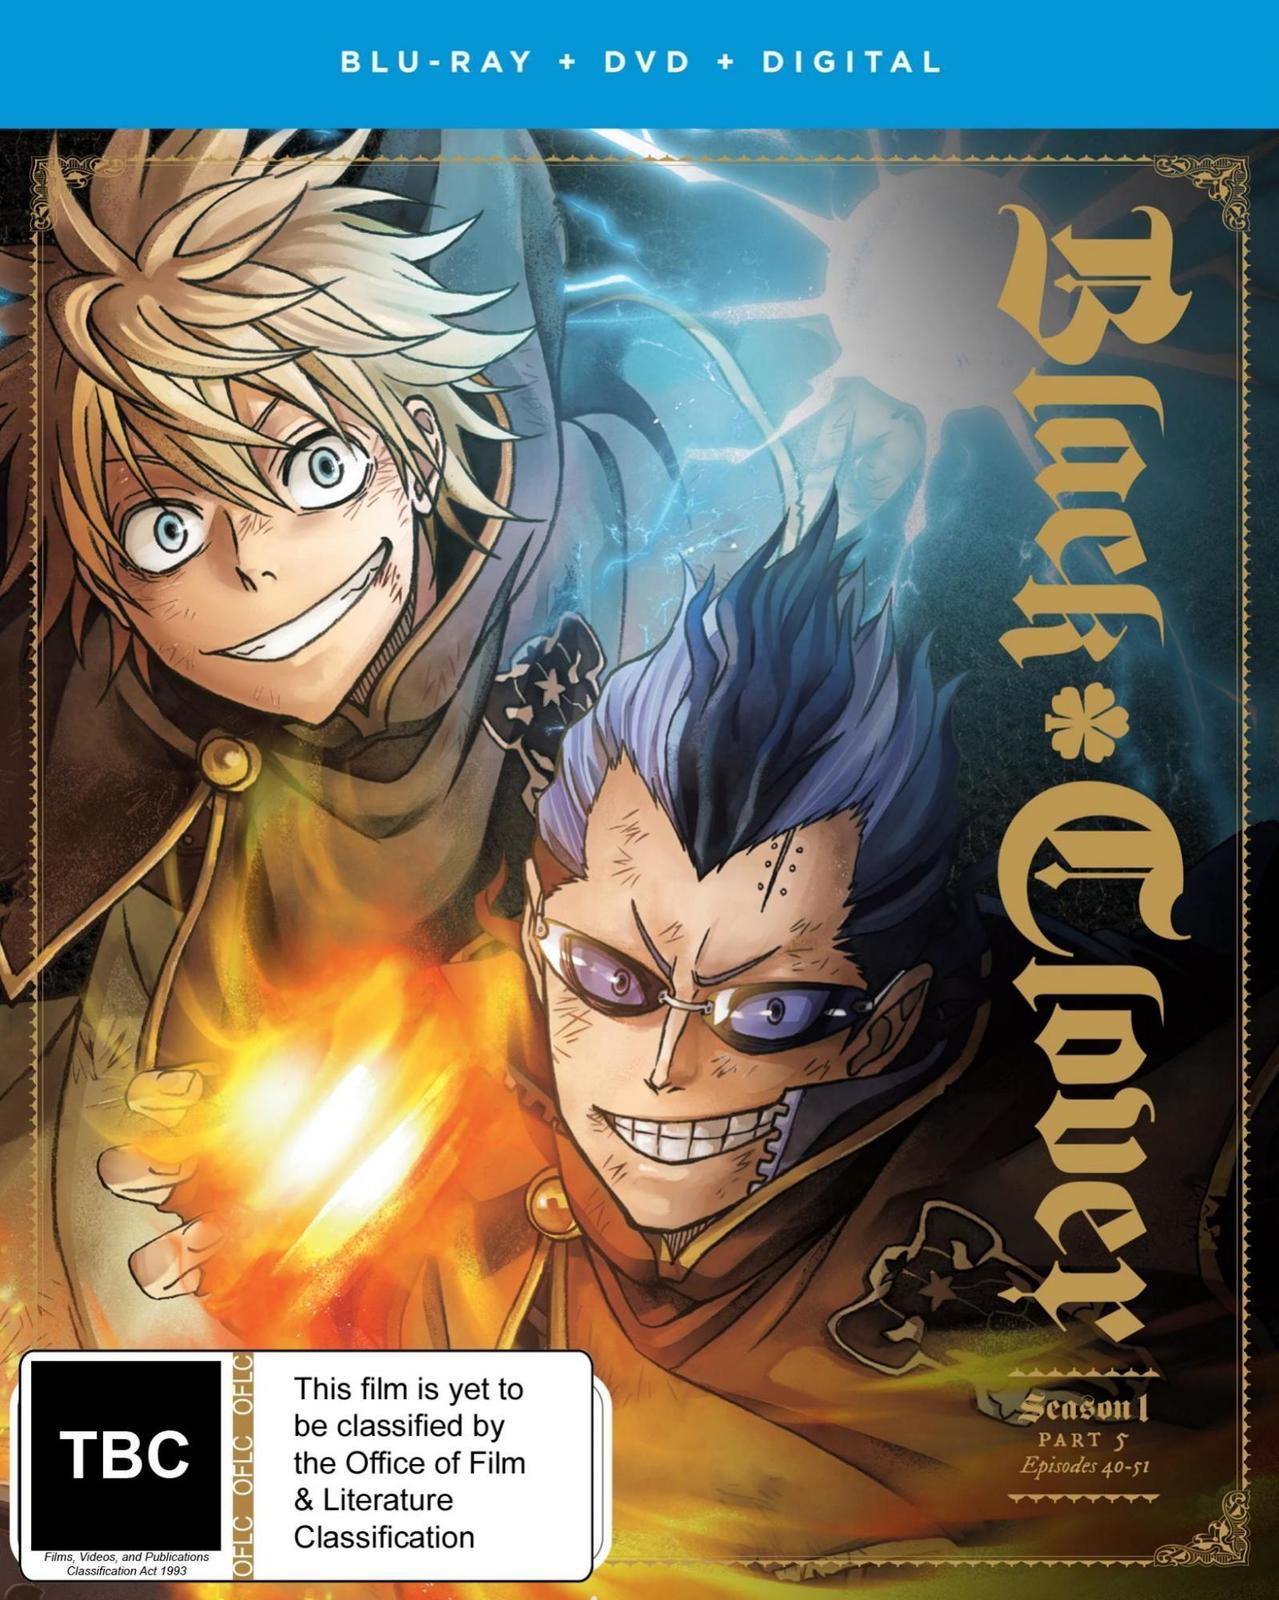 Black Clover: Season 1 - Part 5 (DVD/Blu-ray Combo) on DVD, Blu-ray image